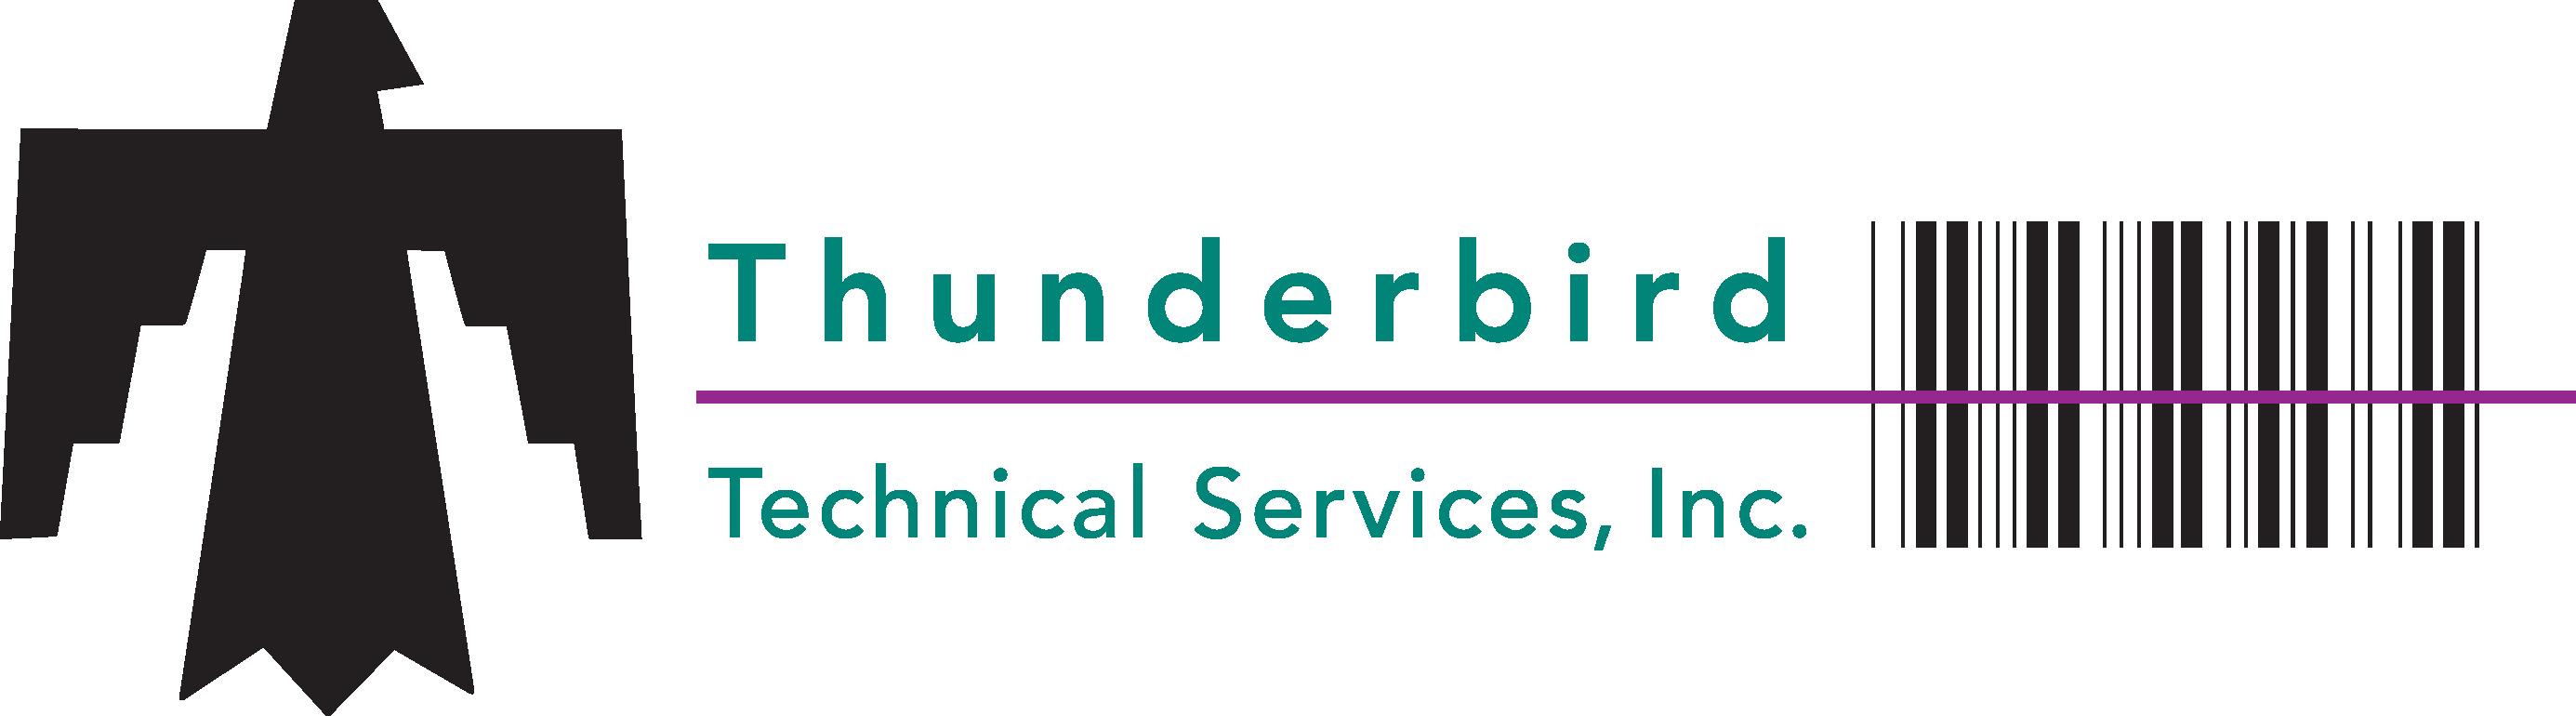 Thunderbird Technical Services, Inc.